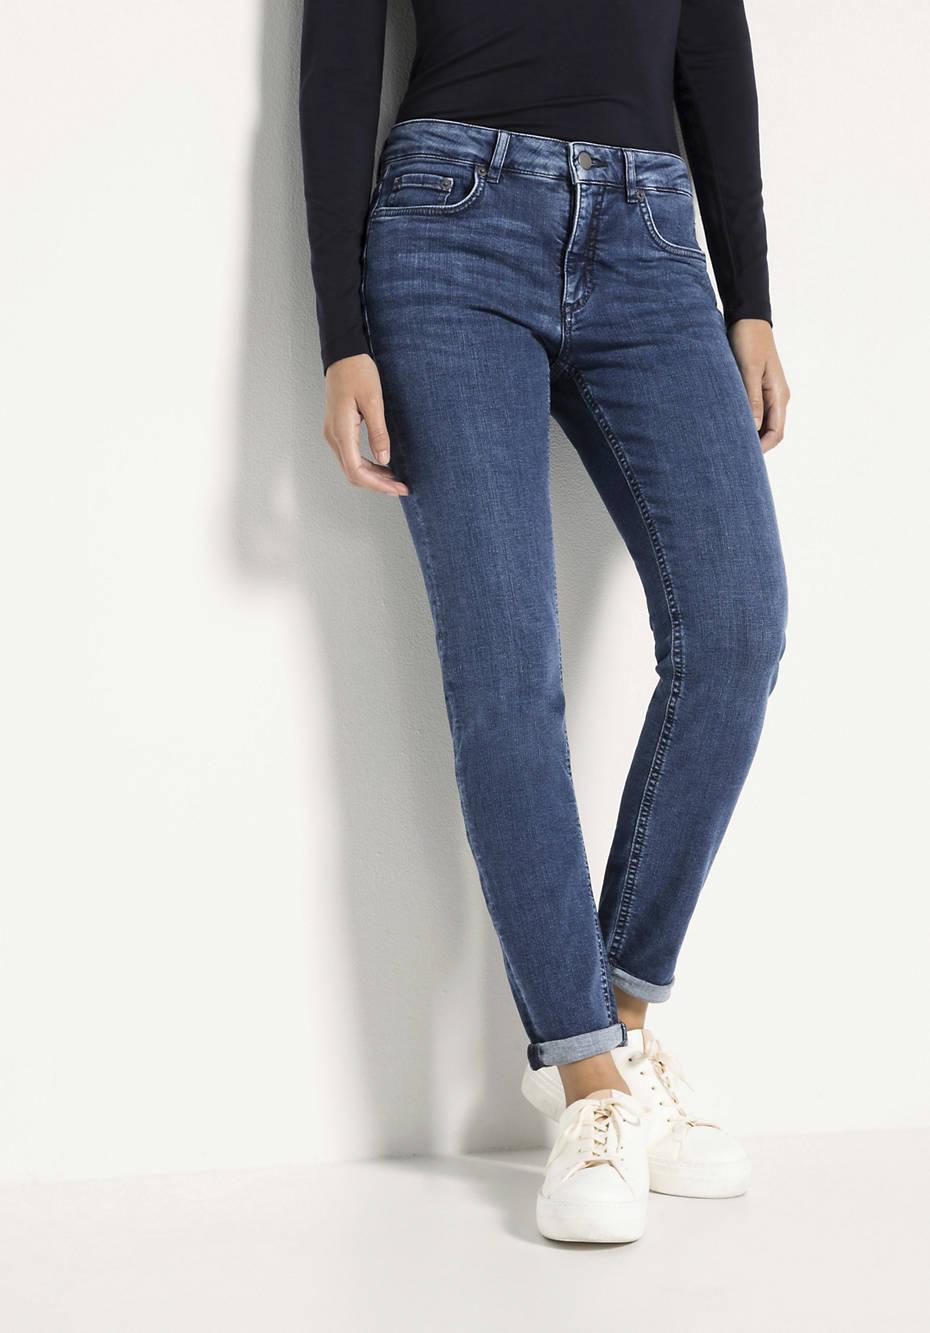 Lina skinny fit jeans made of organic denim